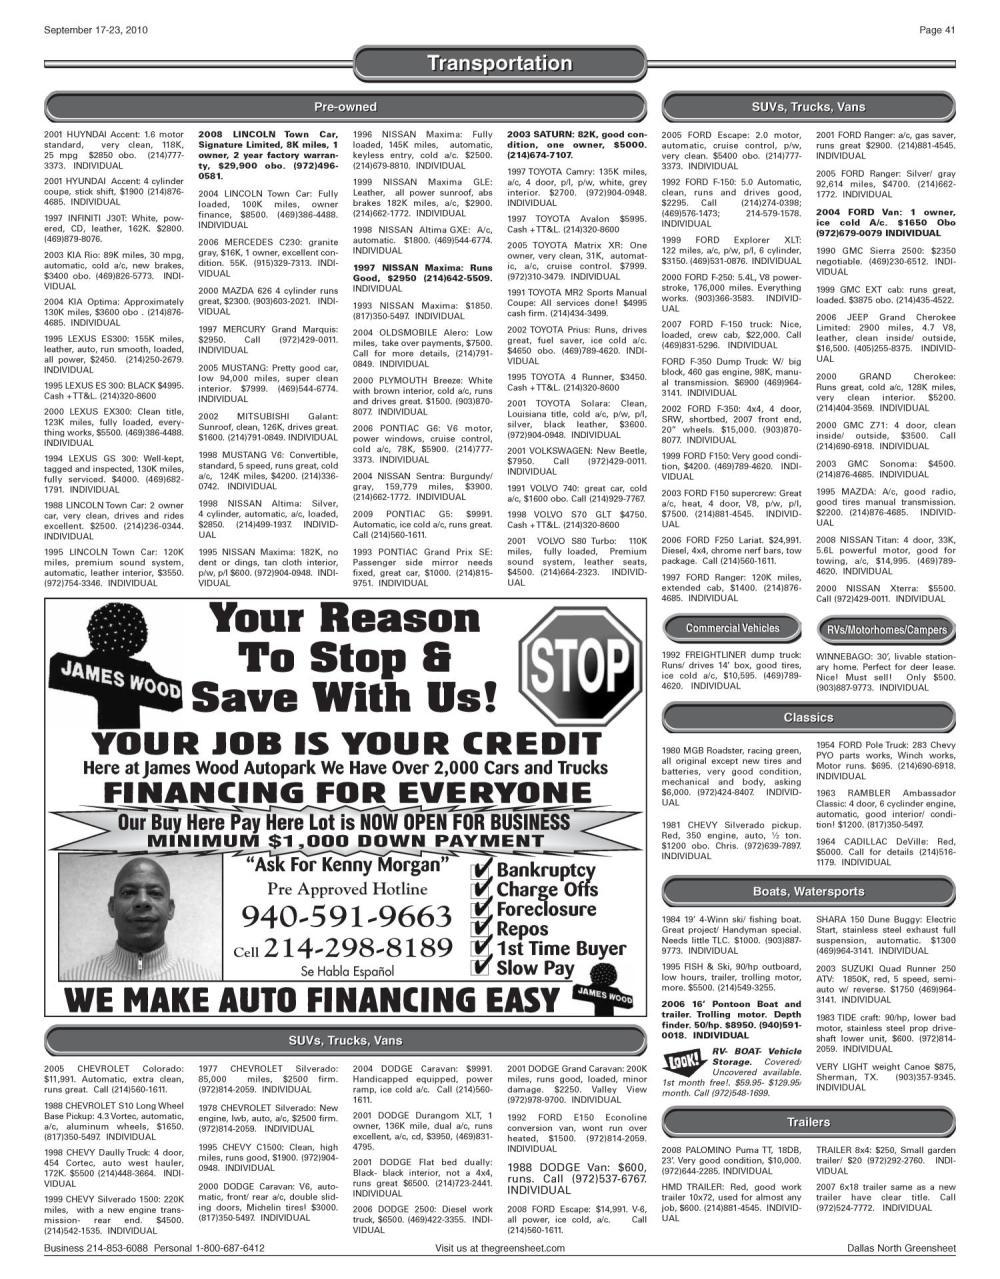 medium resolution of the greensheet dallas tex vol 34 no 168 ed 1 friday september 17 2010 page 41 of 44 the portal to texas history